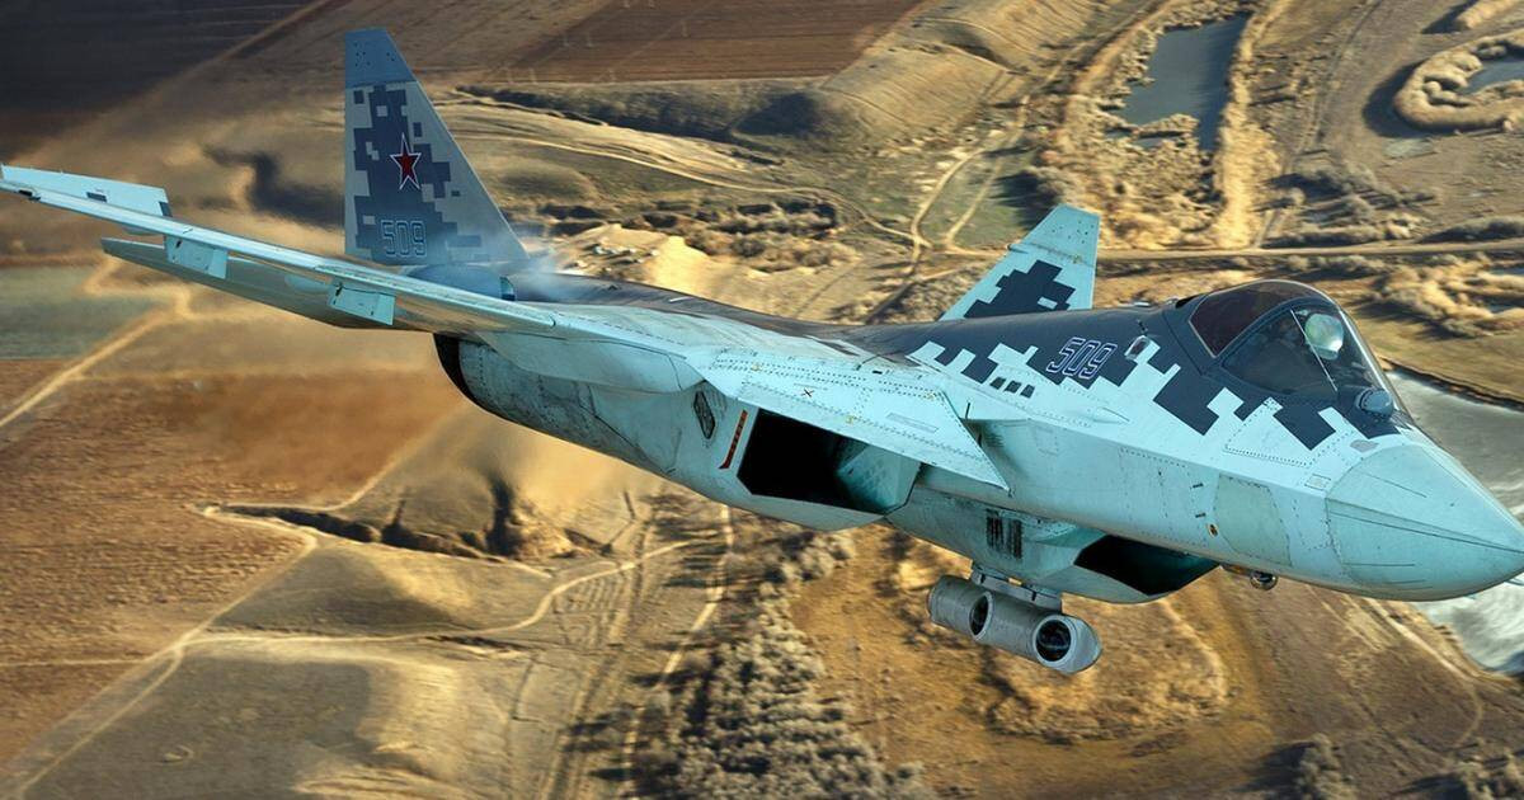 Dieu gi khien tiem kich Su-57 nhinh hon F-22 va vuot xa J-20?-Hinh-12